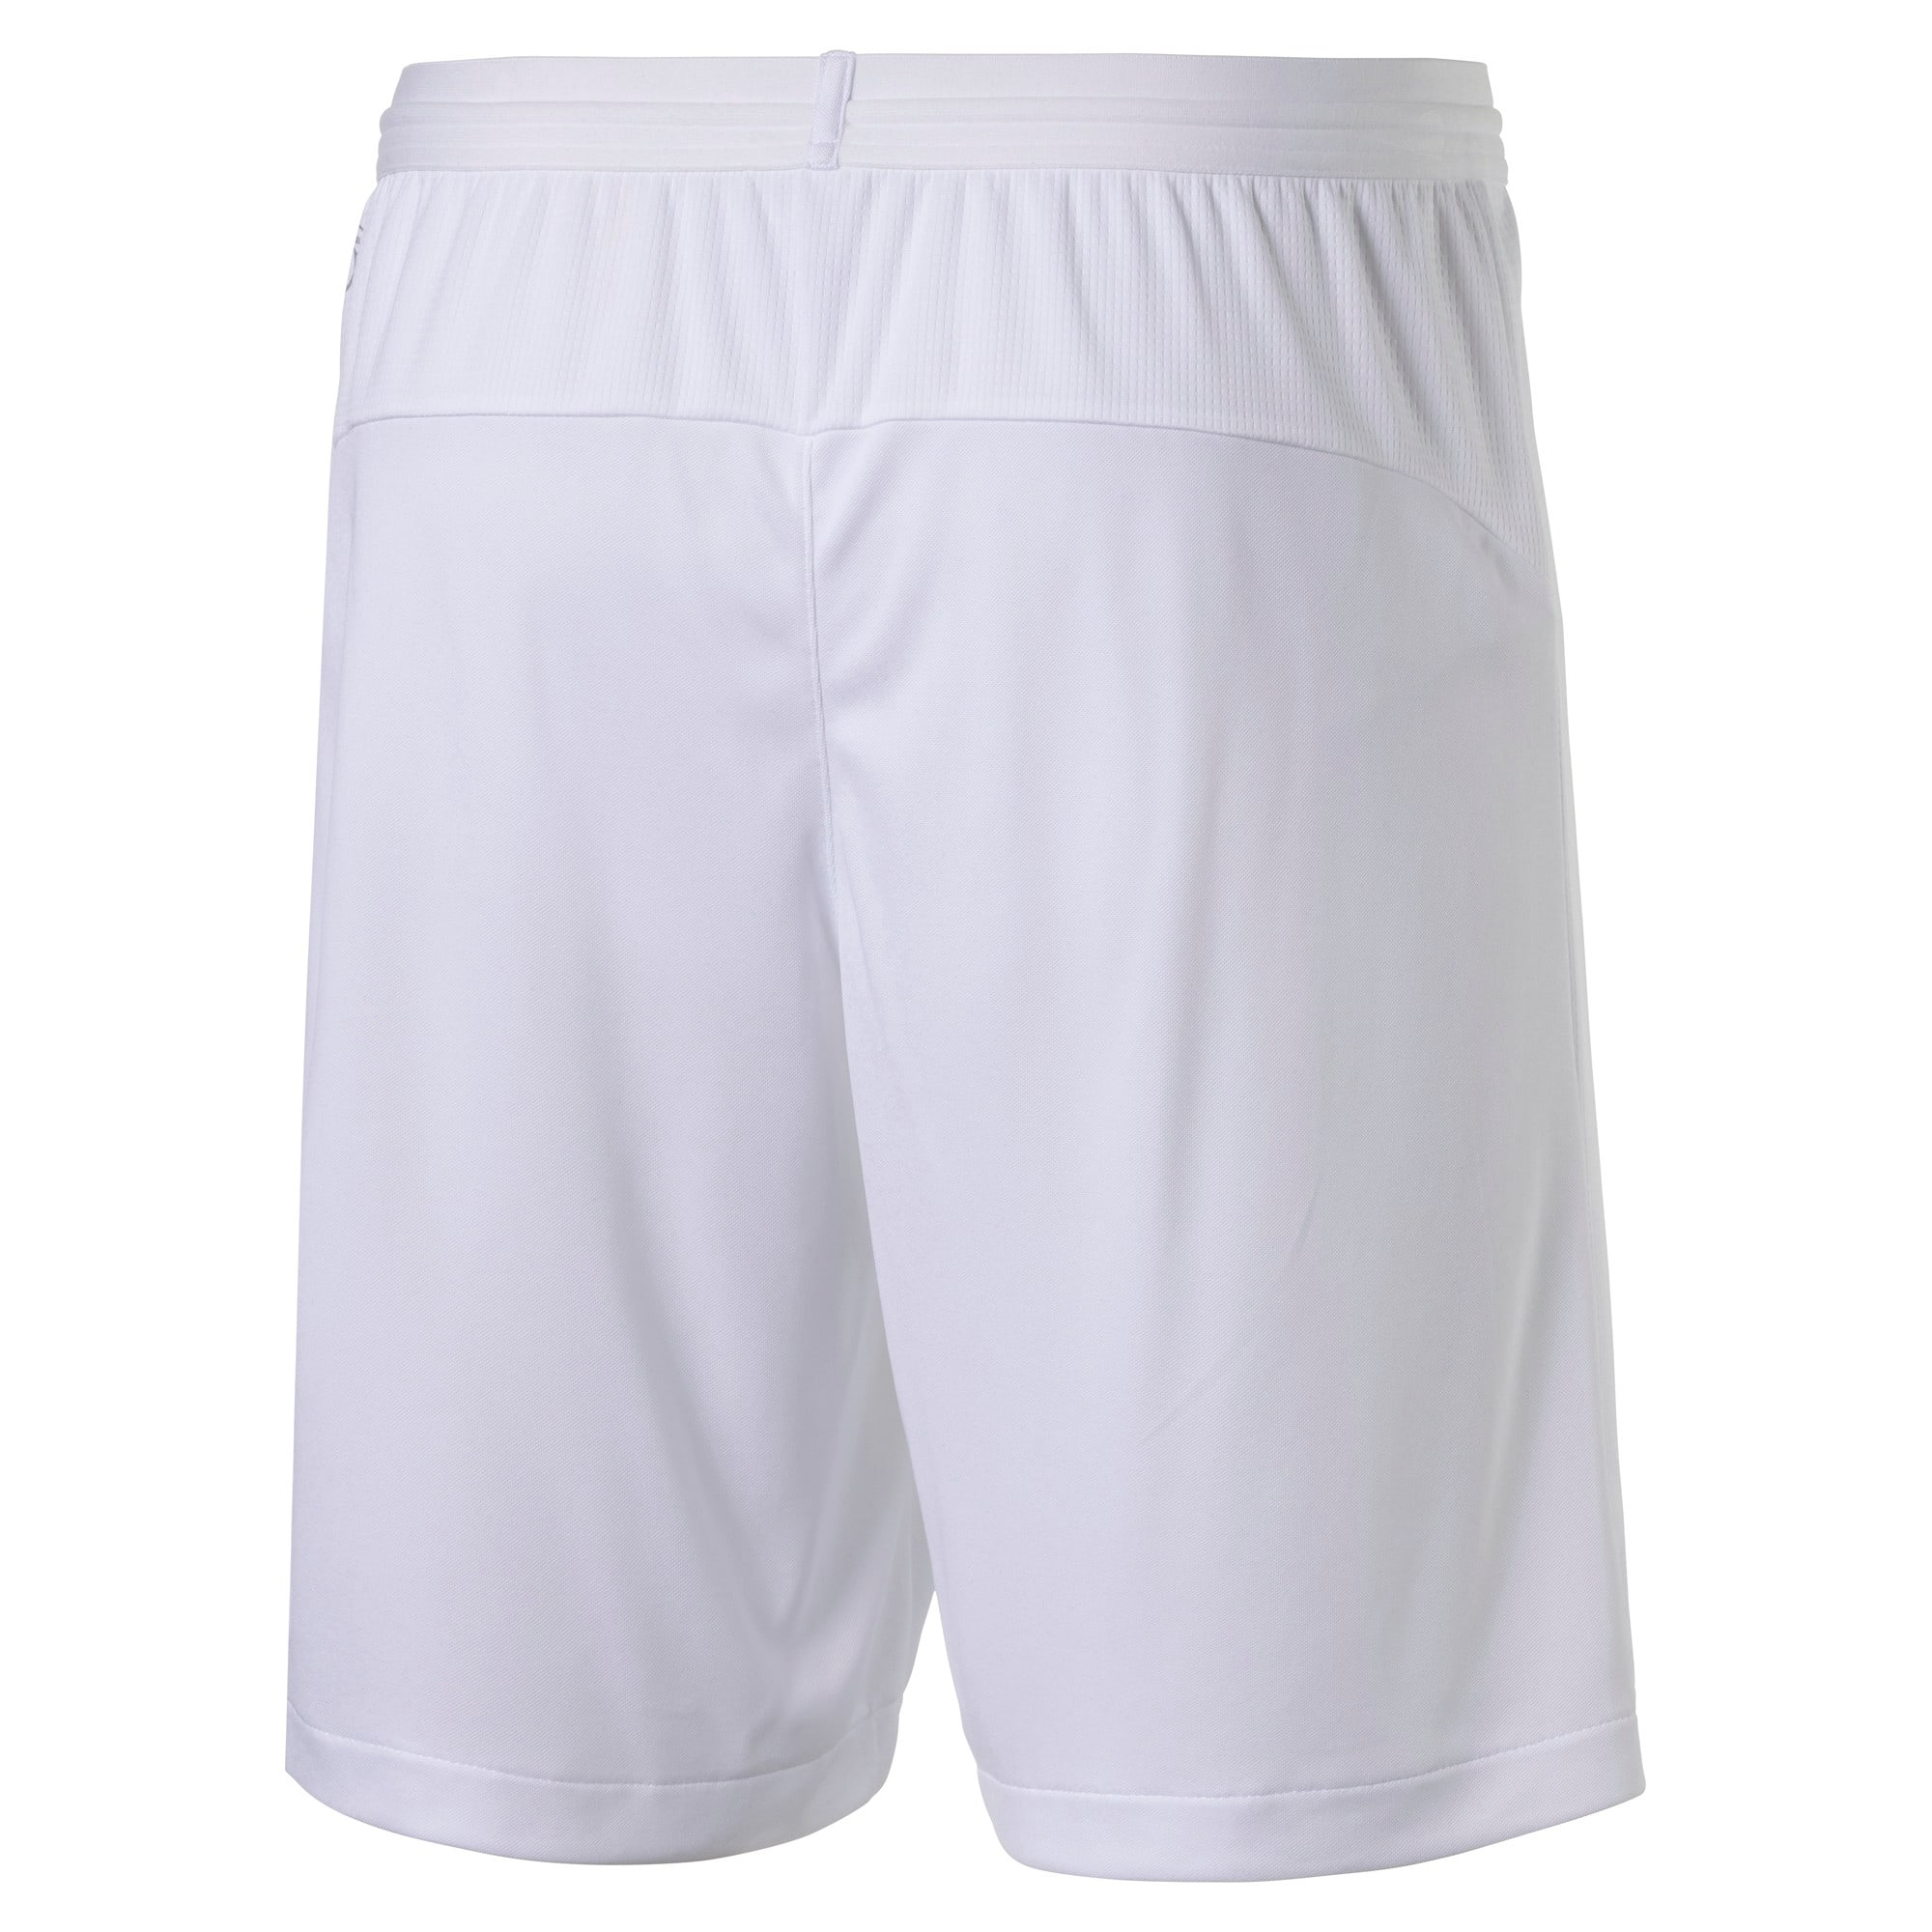 Thumbnail 1 of Österreich Replica Shorts, Puma White, medium